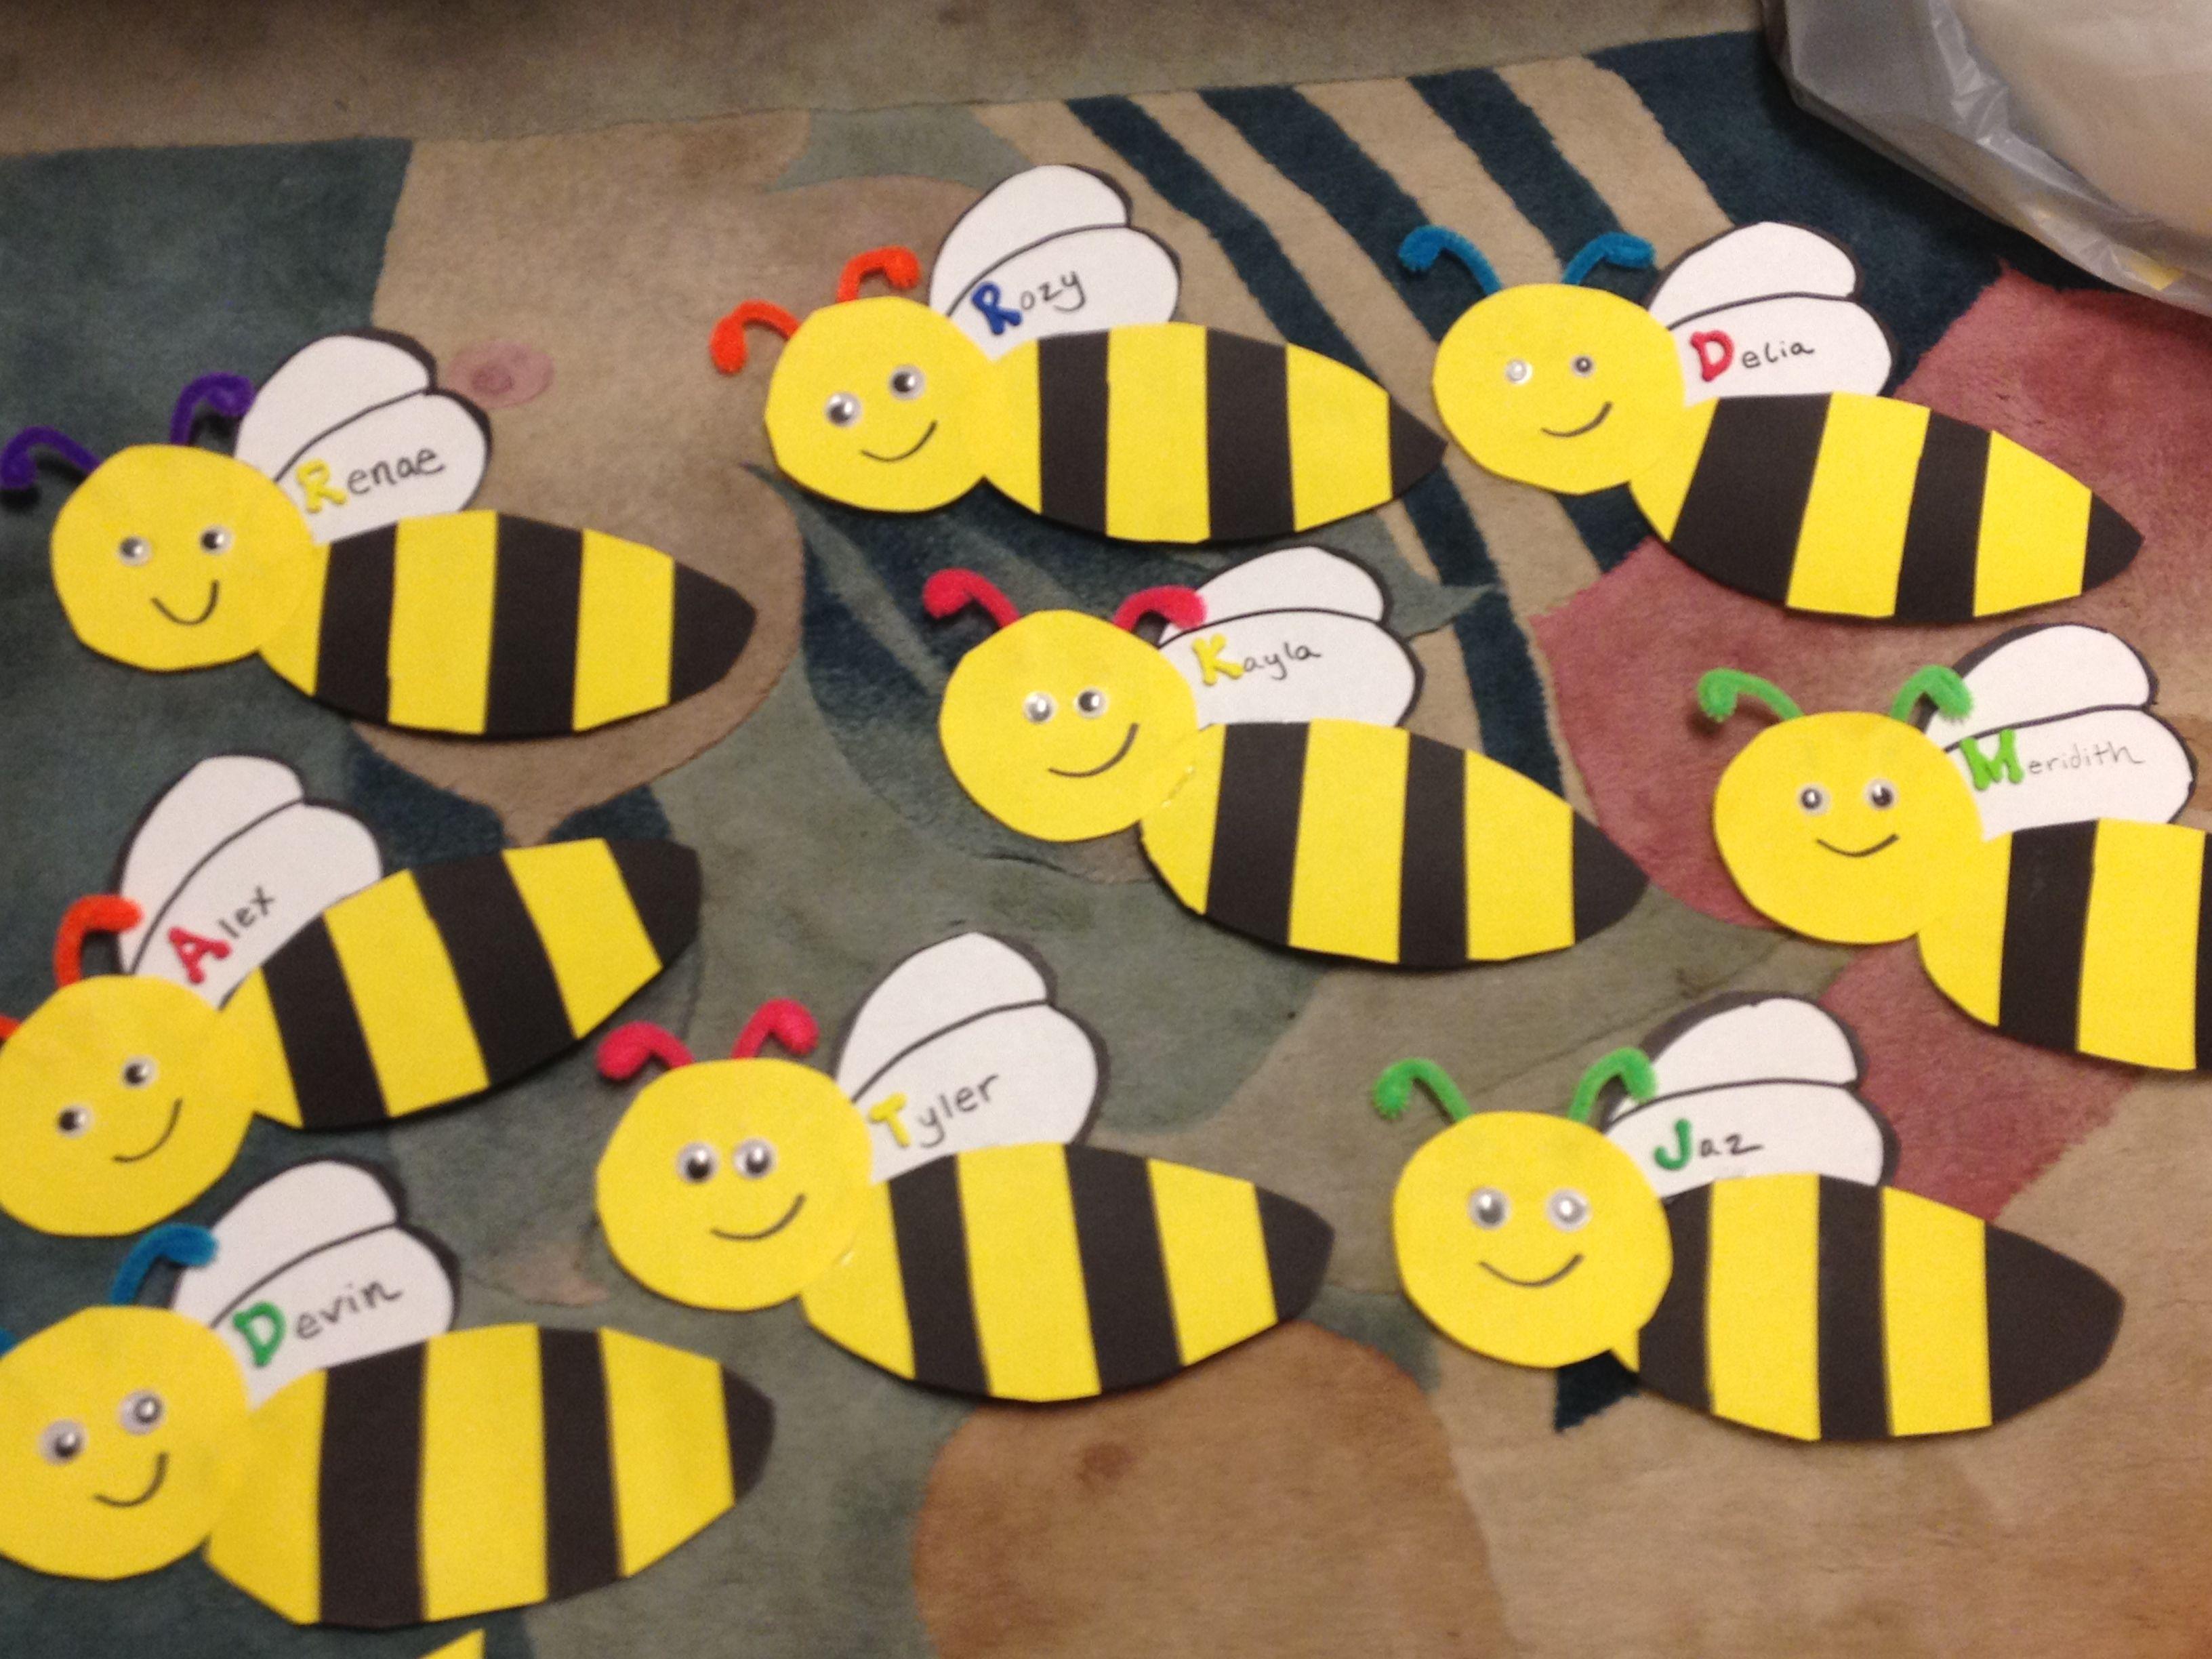 Craft bumble bee - Bumblebee Door Decorations Materials Needed Black Construction Paper Stripes Bright Yellow